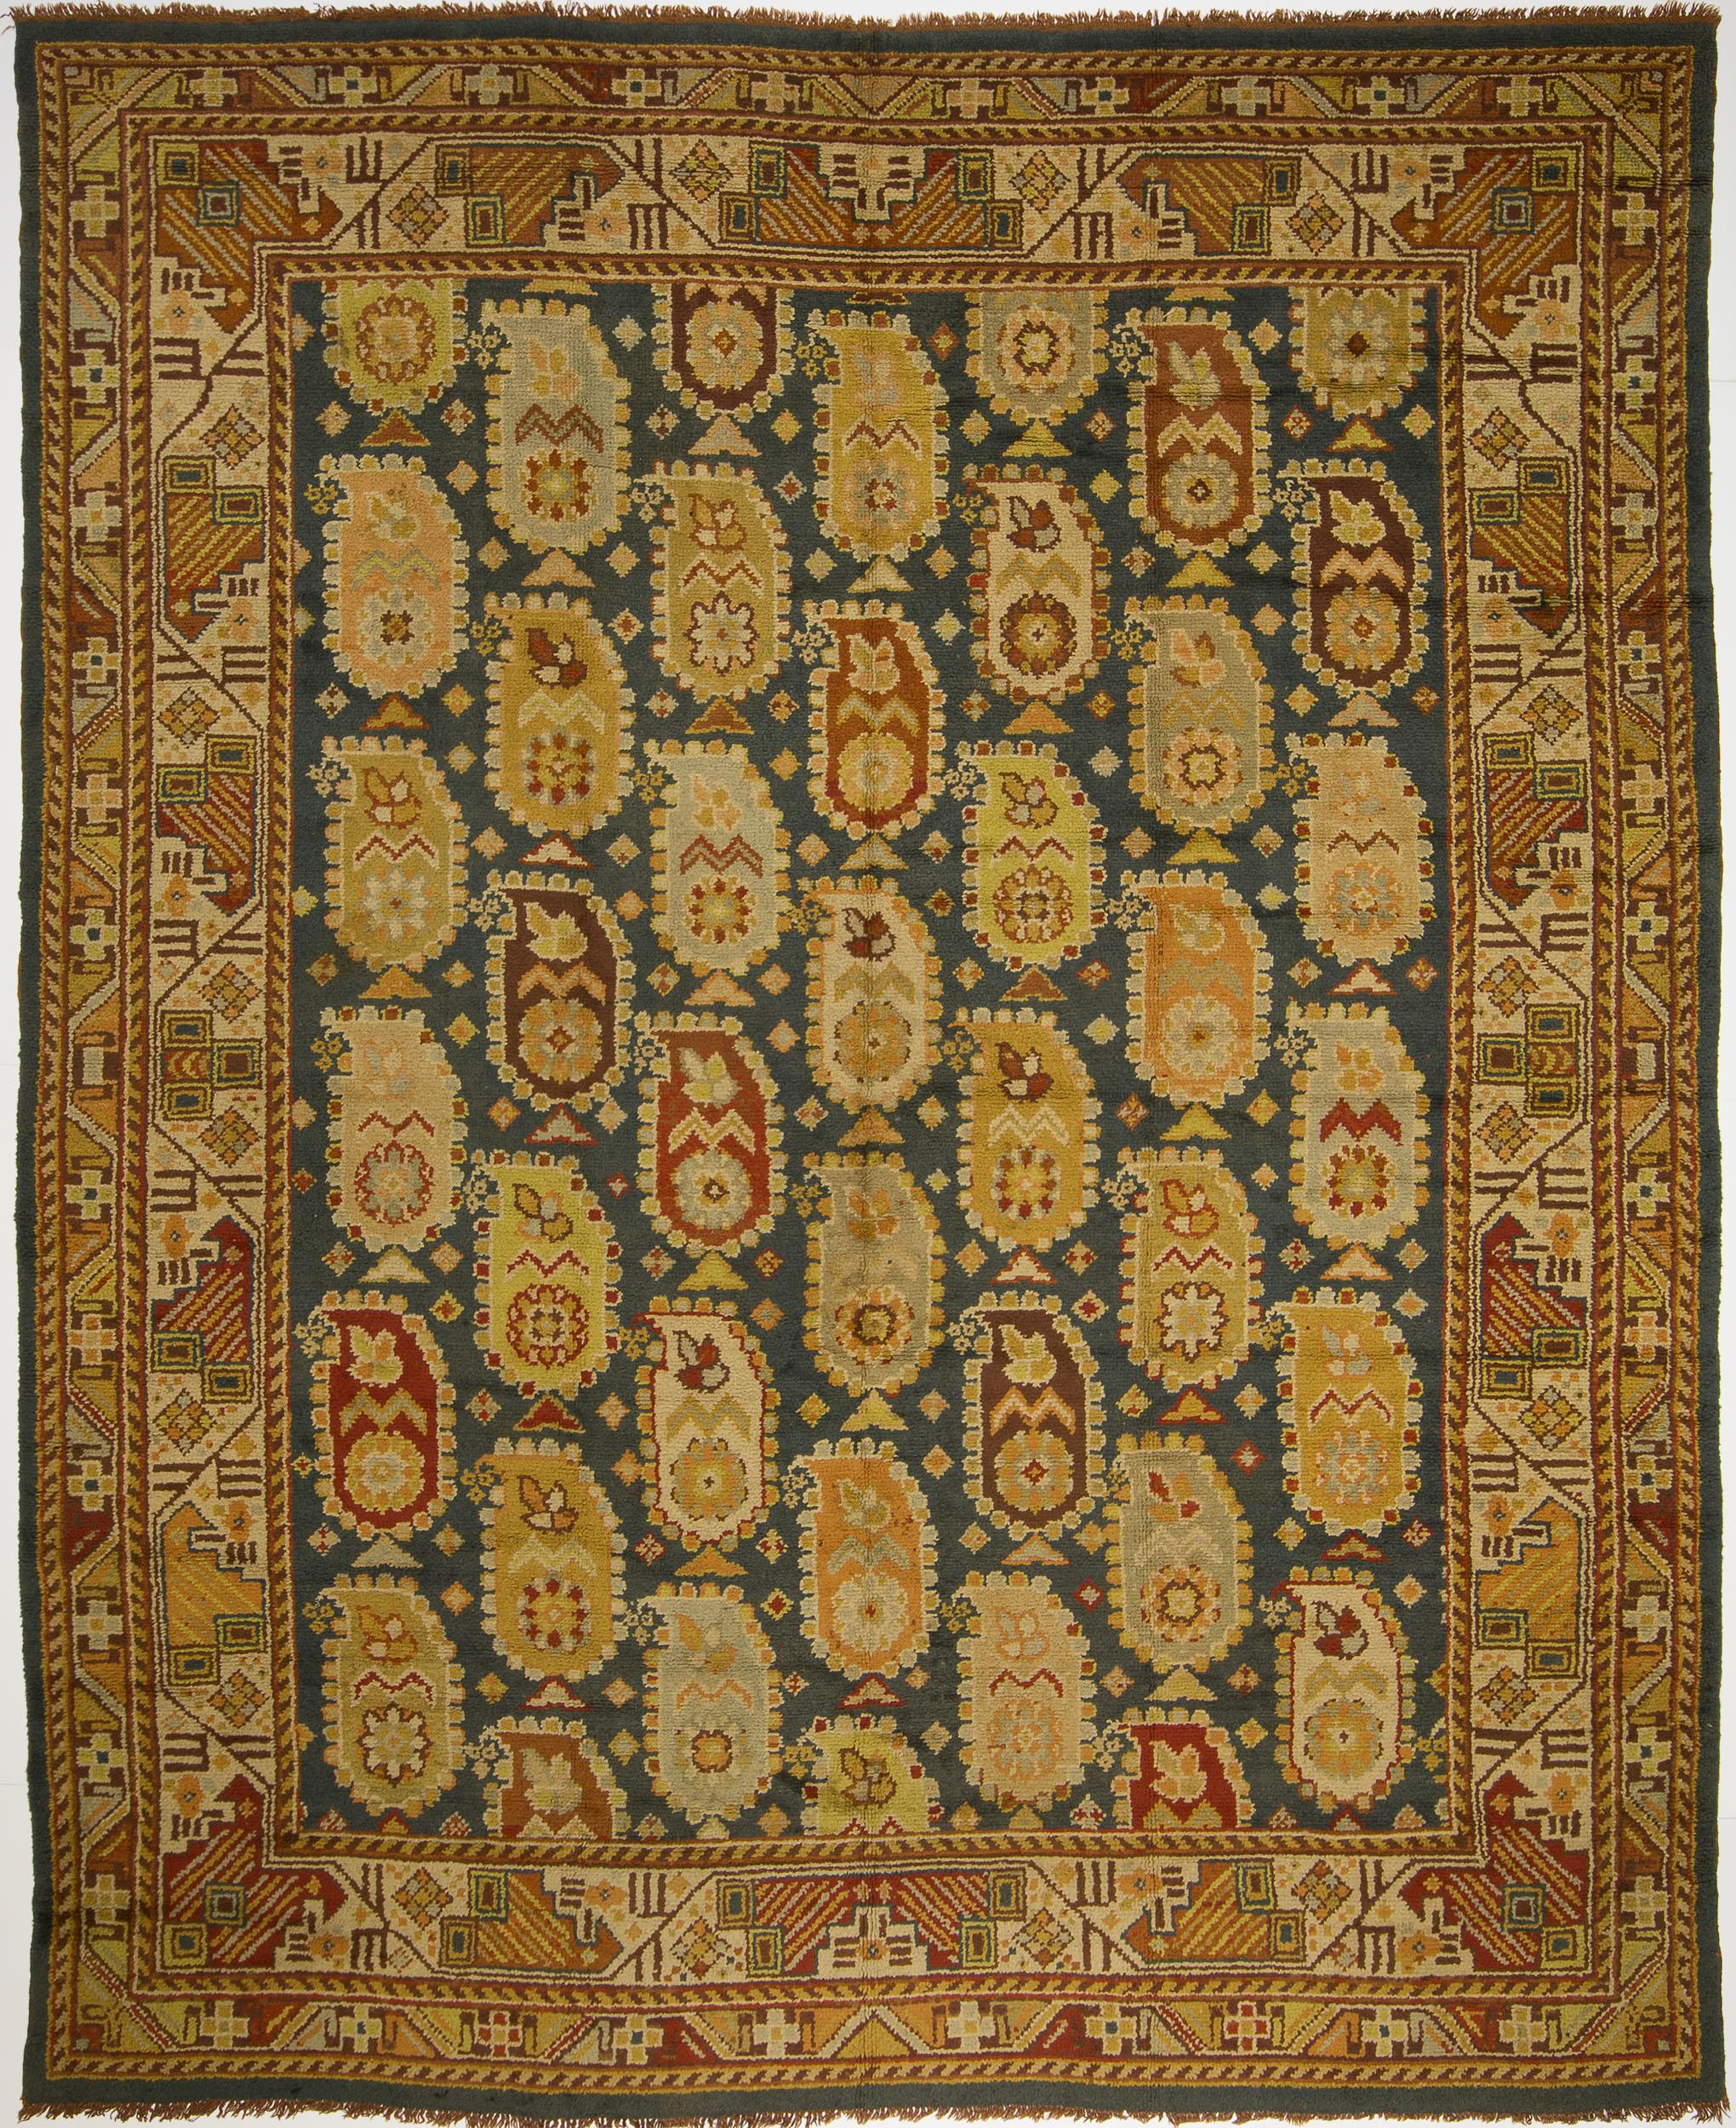 "Copy of Donegal Carpet 14' 5"" x 11' 8"""